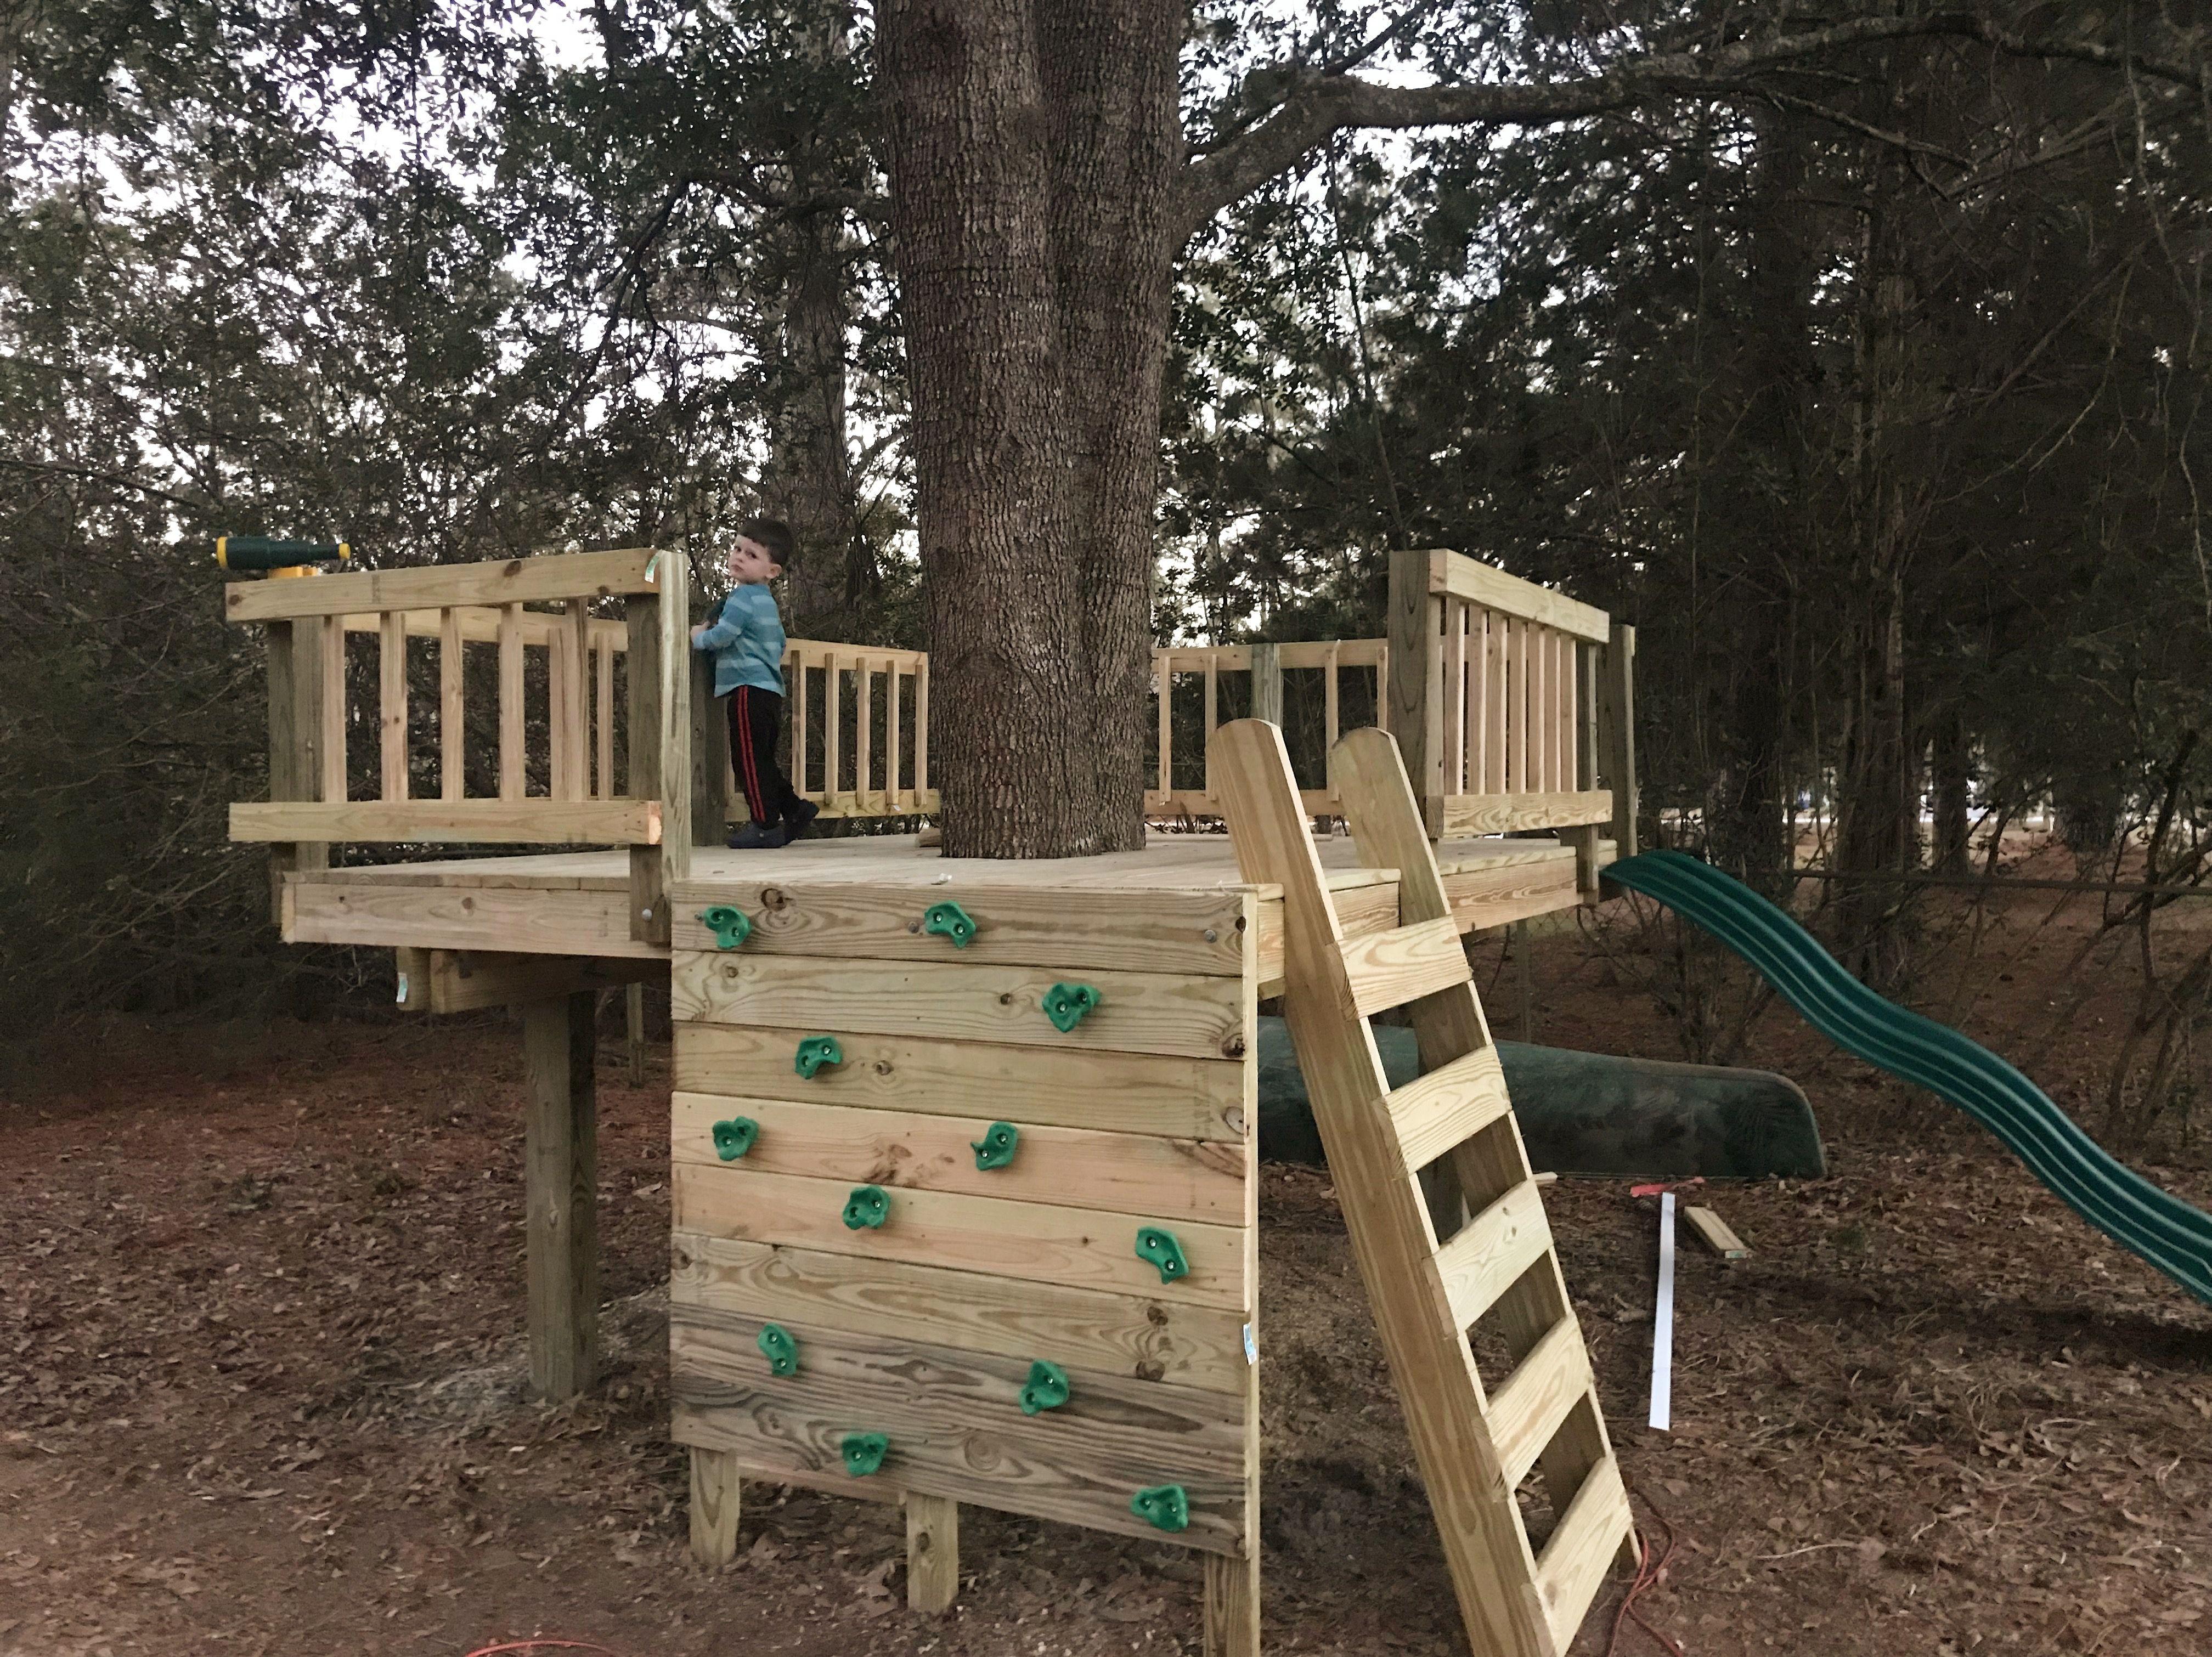 Diy tree fort kids rock wall tree house railing play